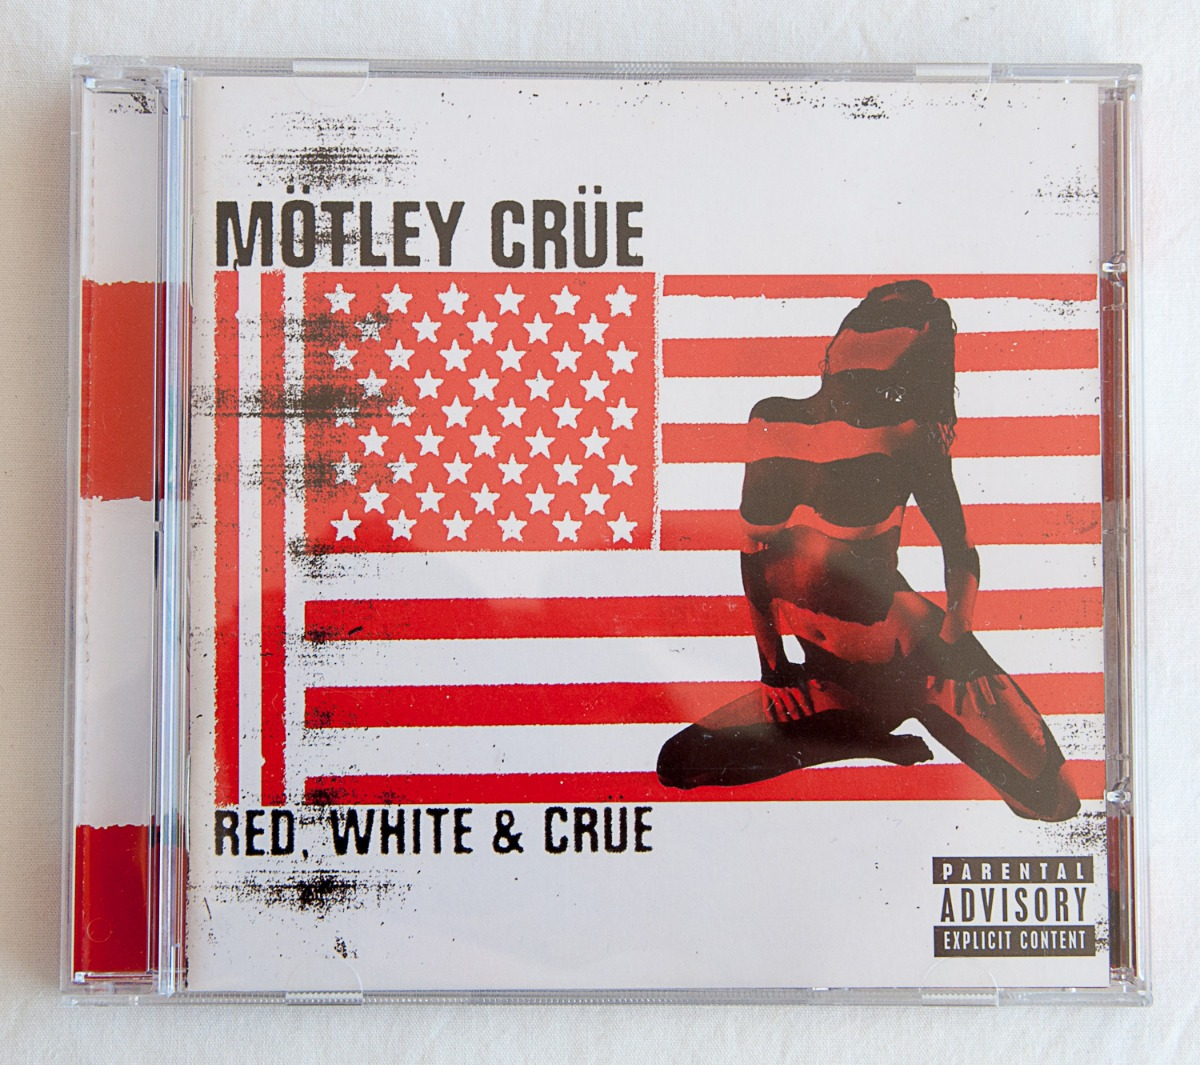 d8b28bacf7e93 Cd Mötley Crüe - Red, White & Crue